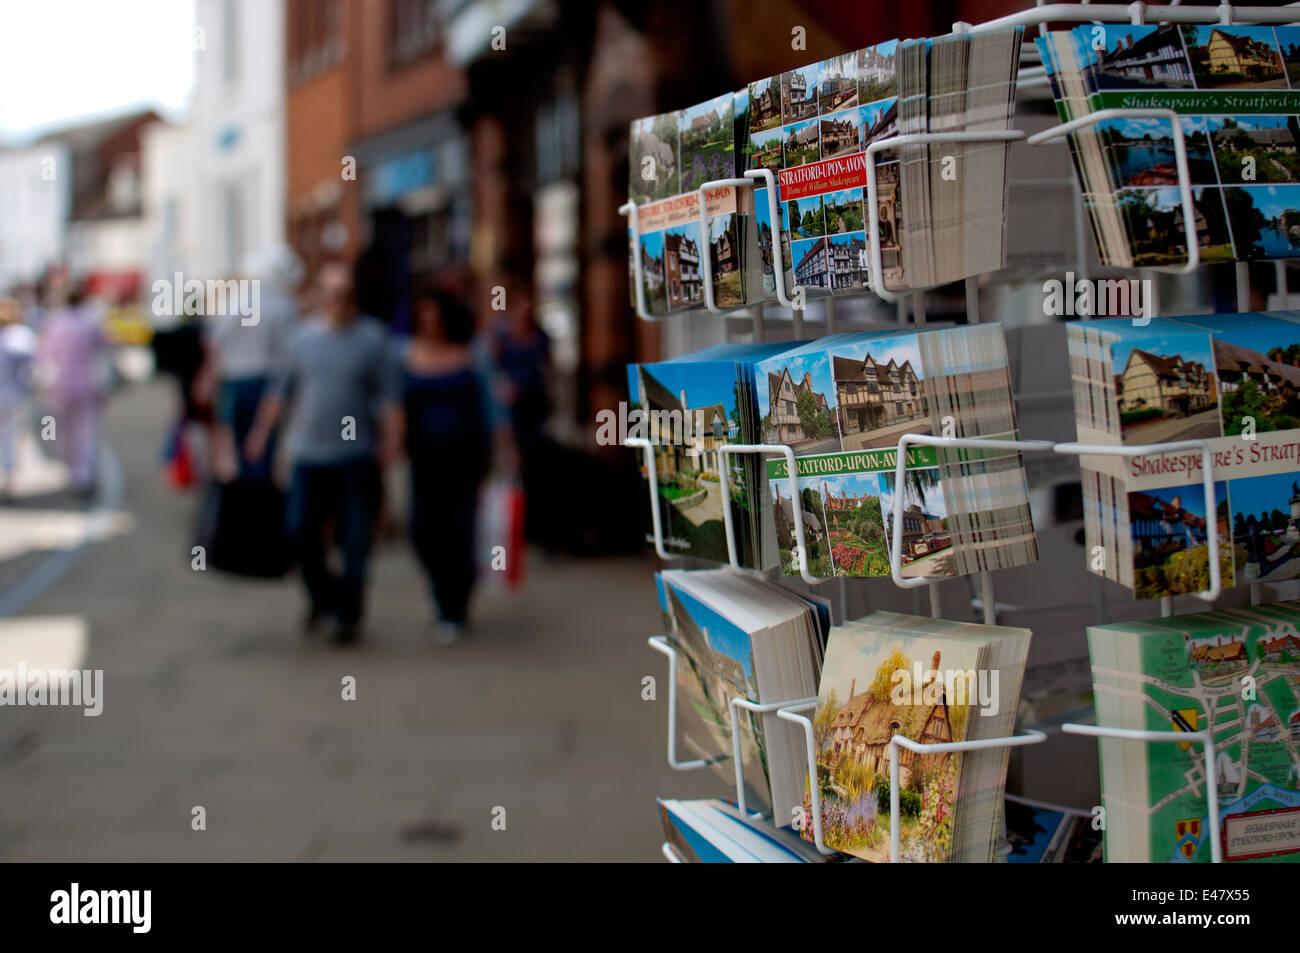 Post card rack, Stratford-upon-Avon, Royaume-Uni Photo Stock